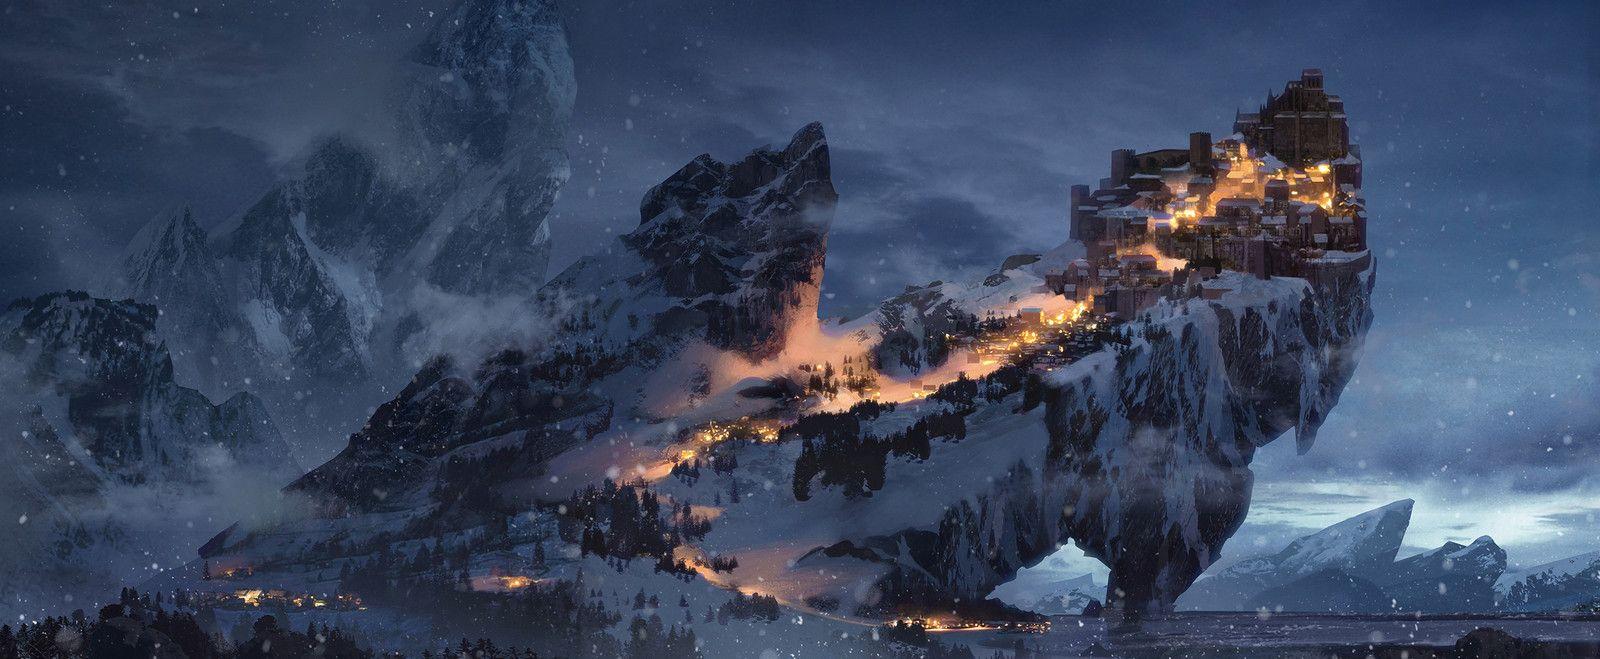 Winter Keep, Bram Sels on ArtStation at https://www.artstation.com/artwork/JnzXn